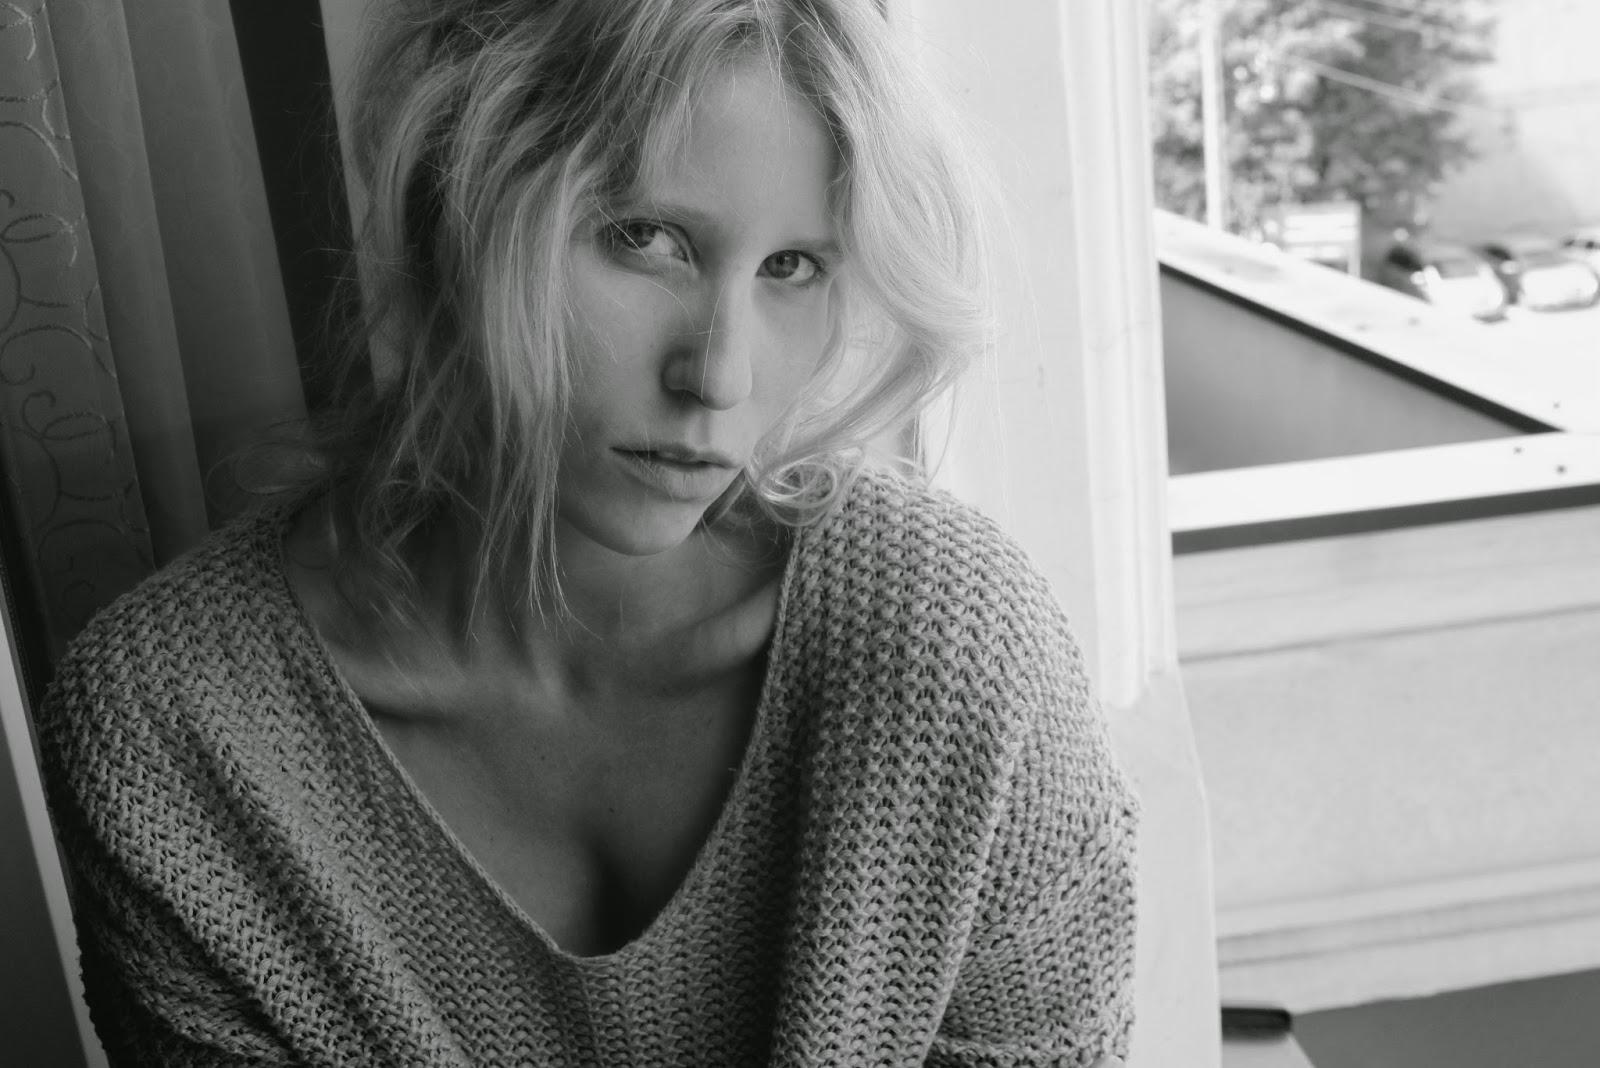 Sonia Roszczuk Nude Photos 72